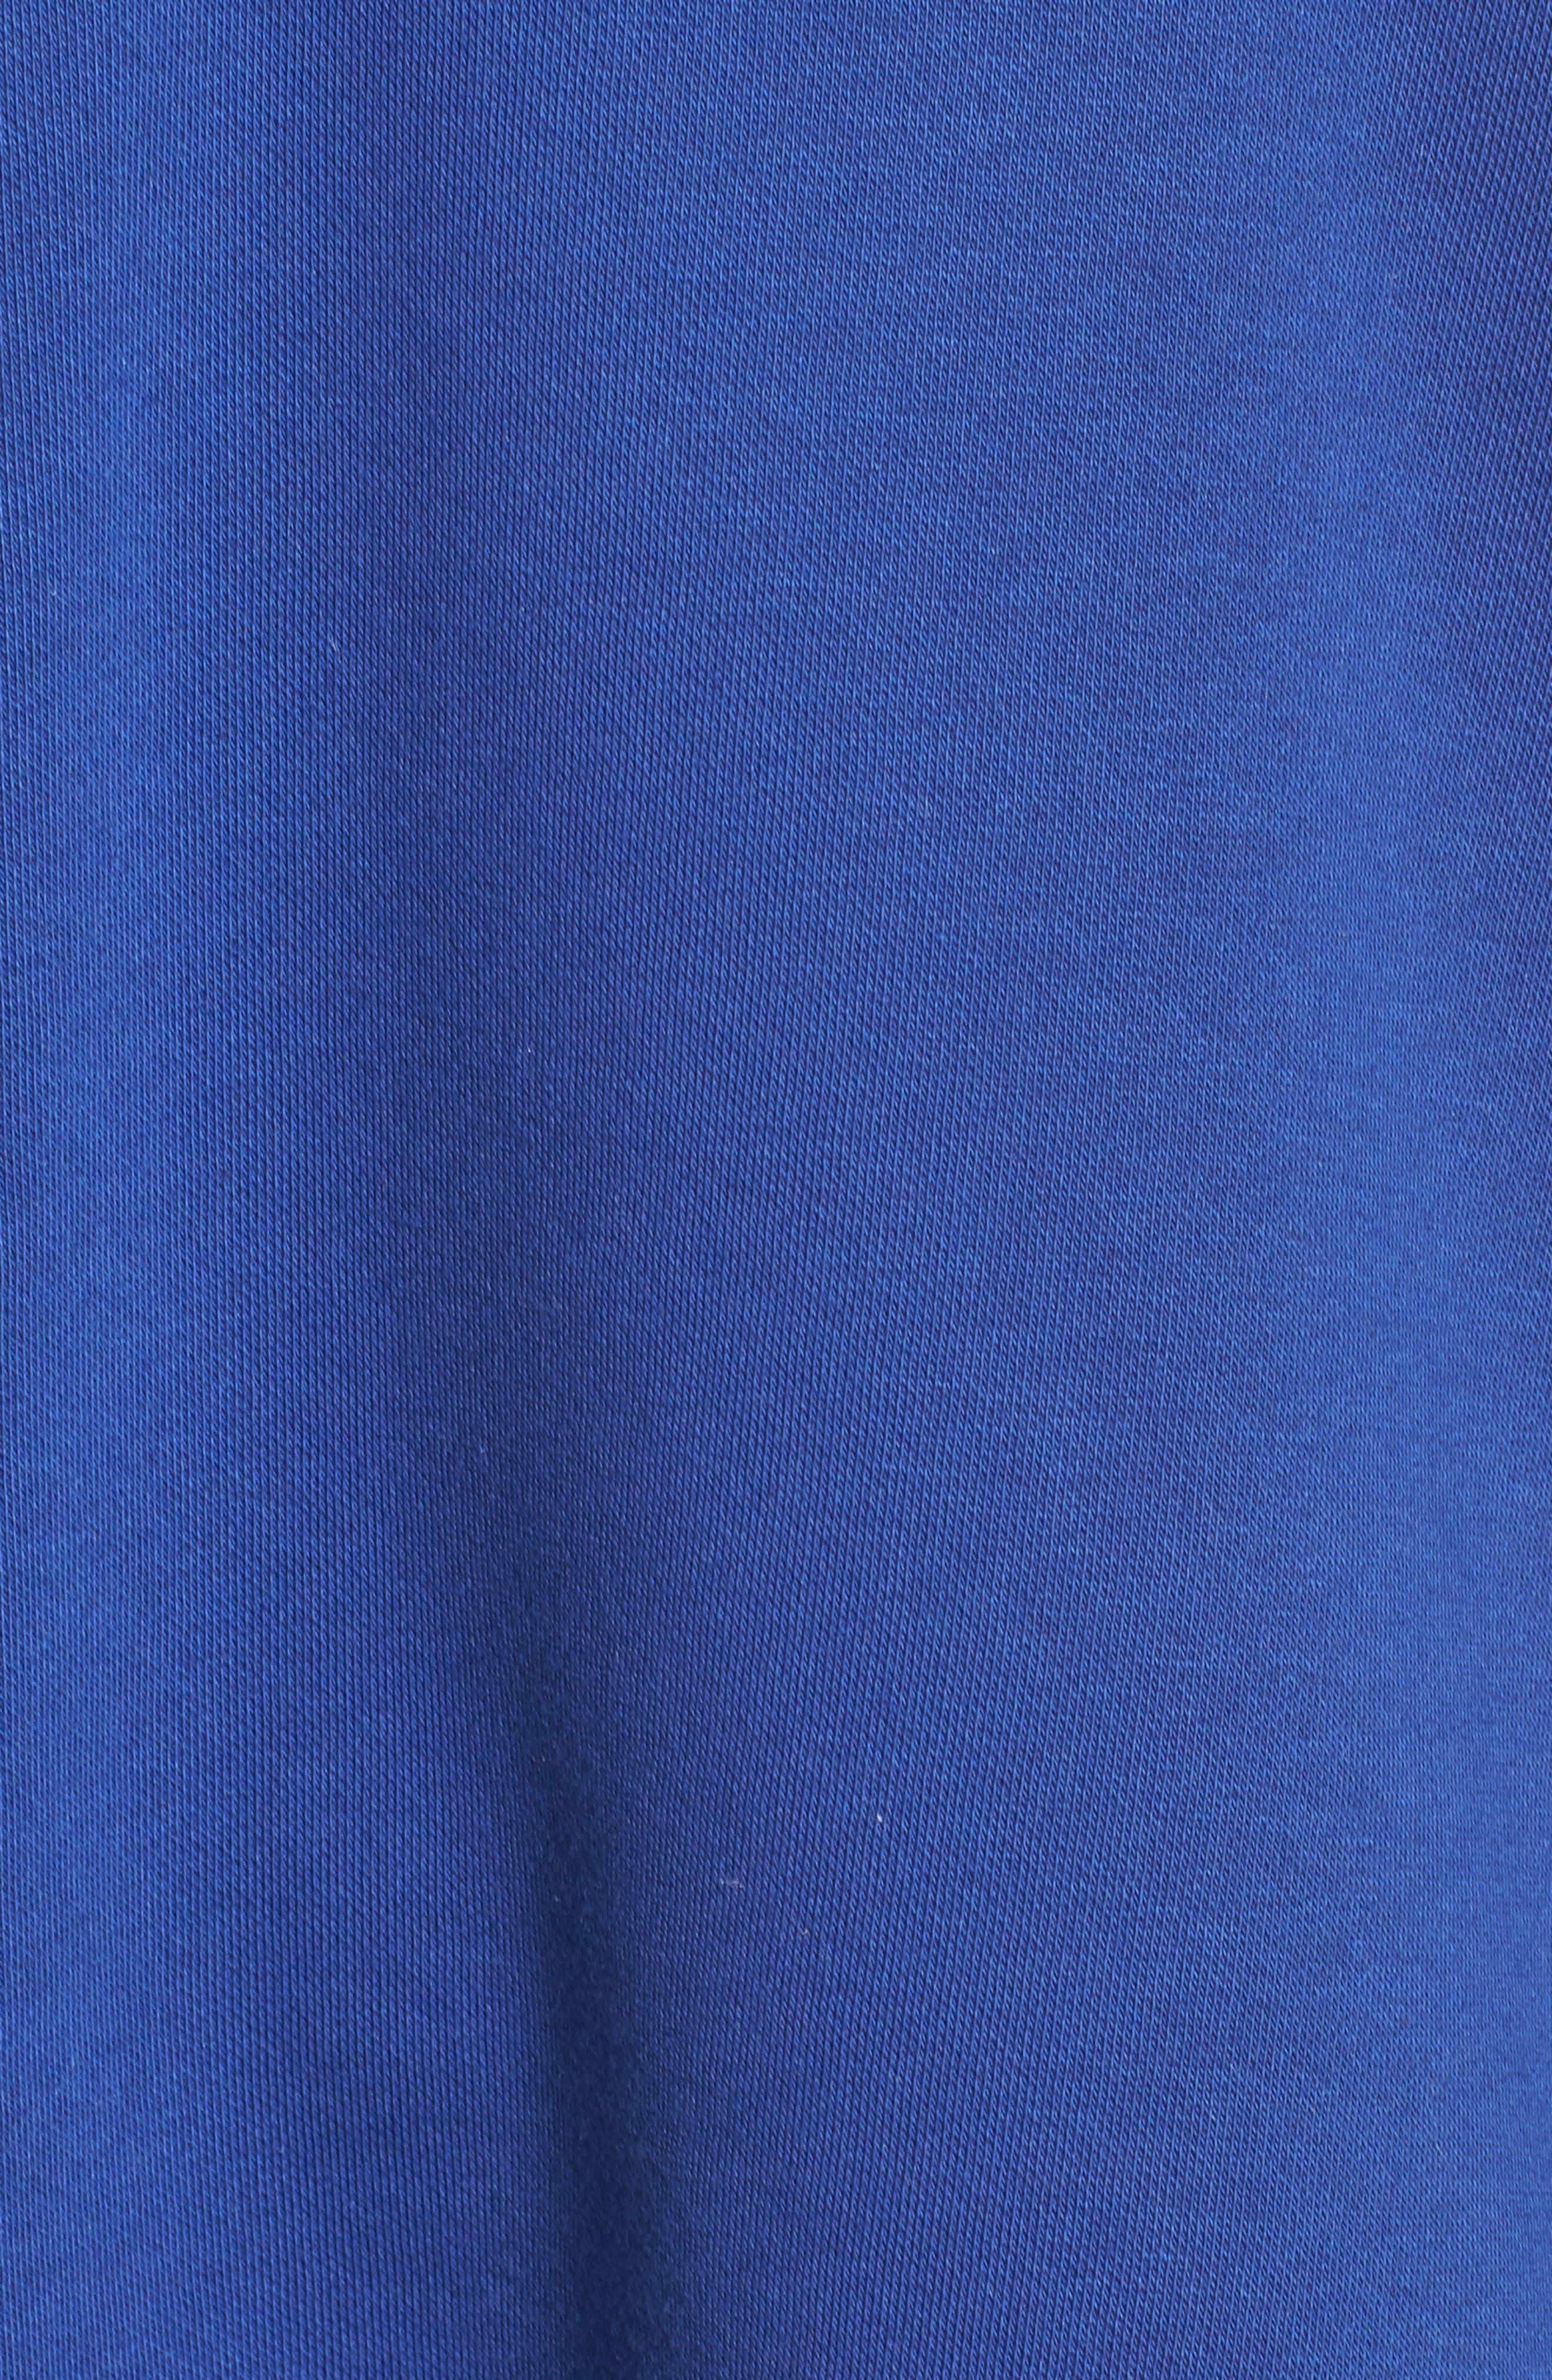 Archive No. 1 Oversize Hoodie,                             Alternate thumbnail 6, color,                             Blue Depths